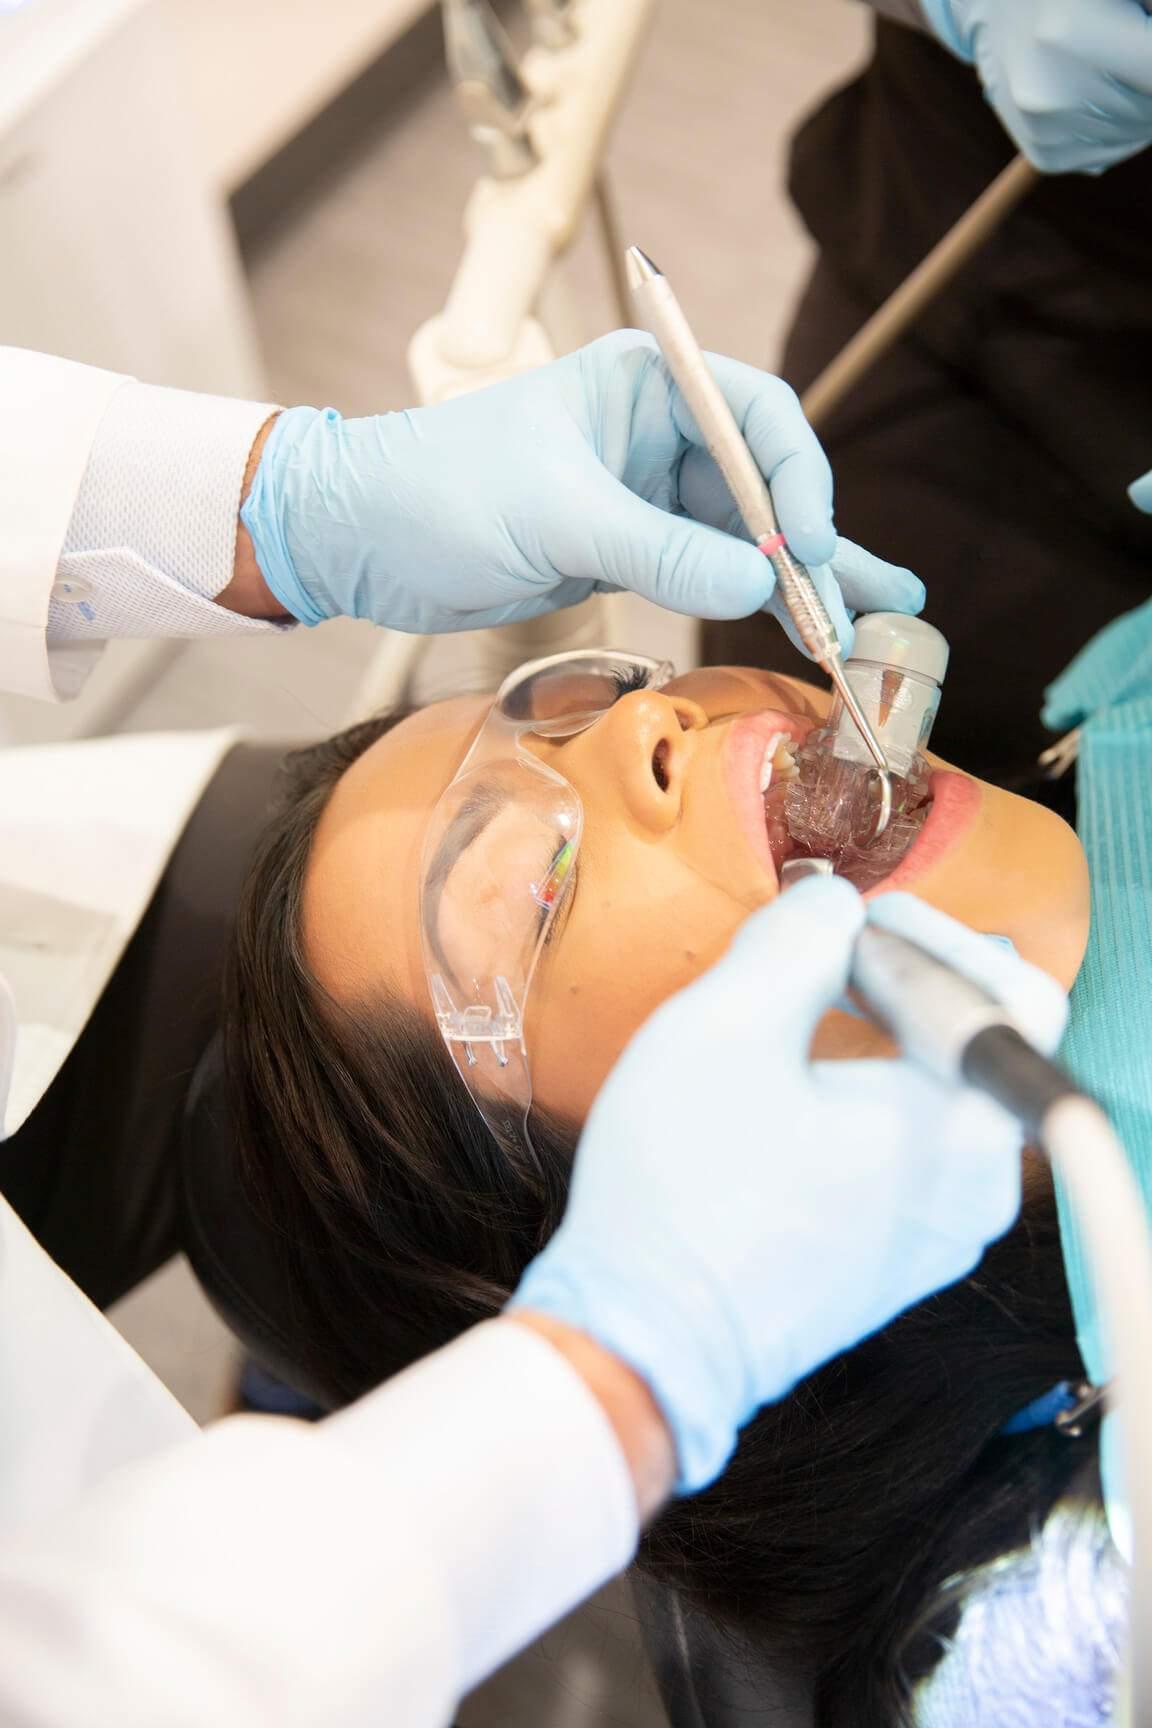 Treatment of TMJ (TMD)